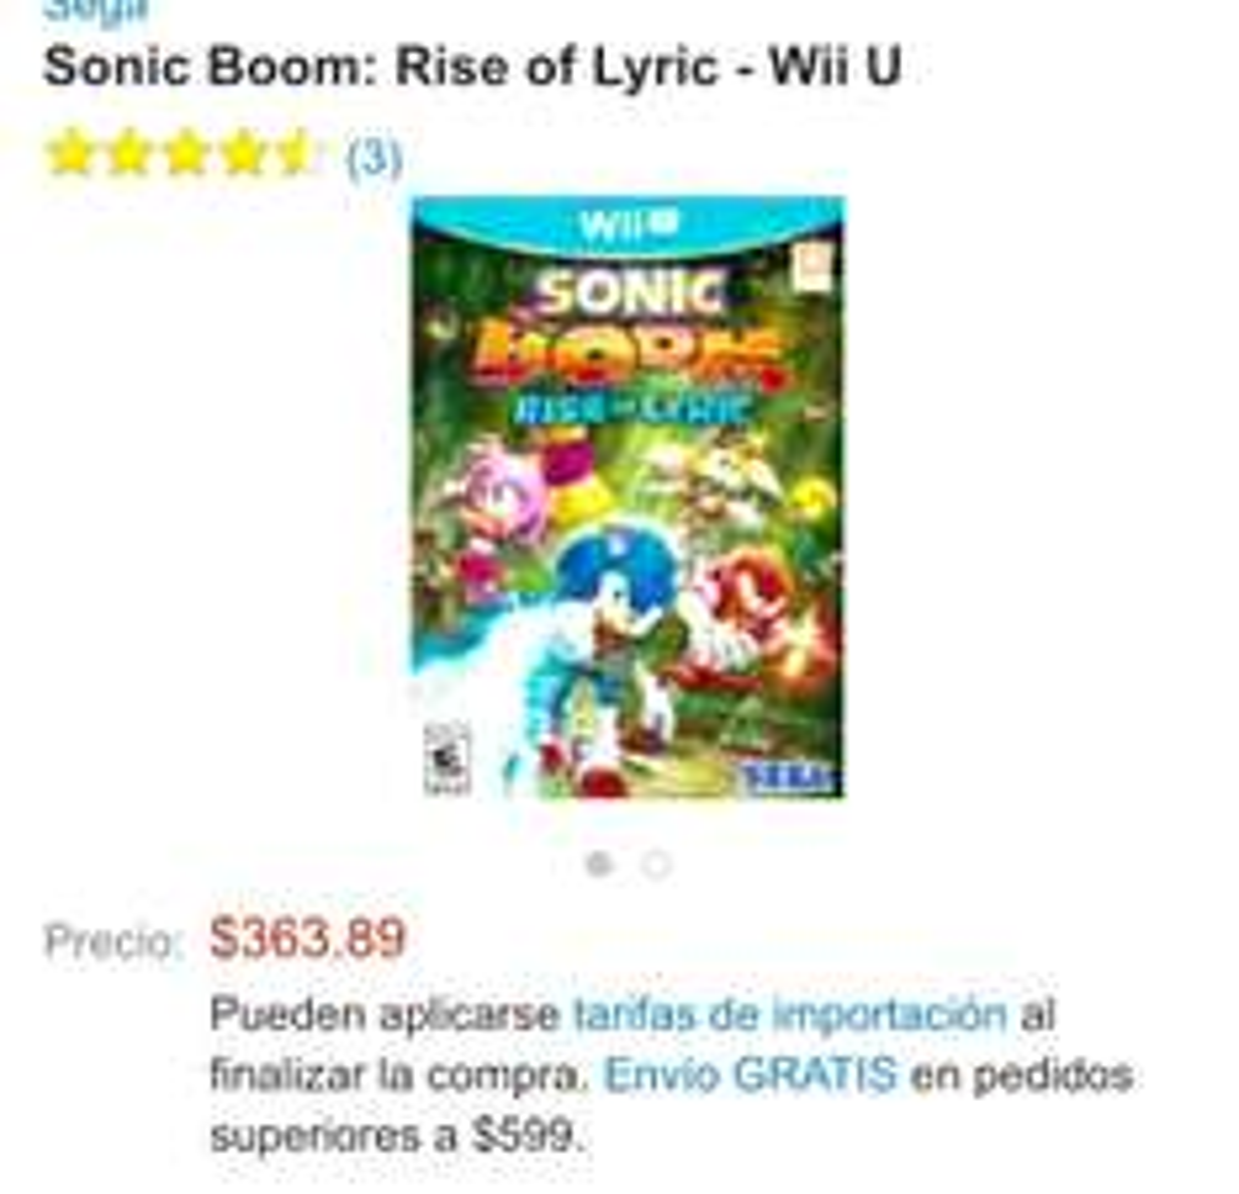 SONIC BOOM para Wii U. Amazon México